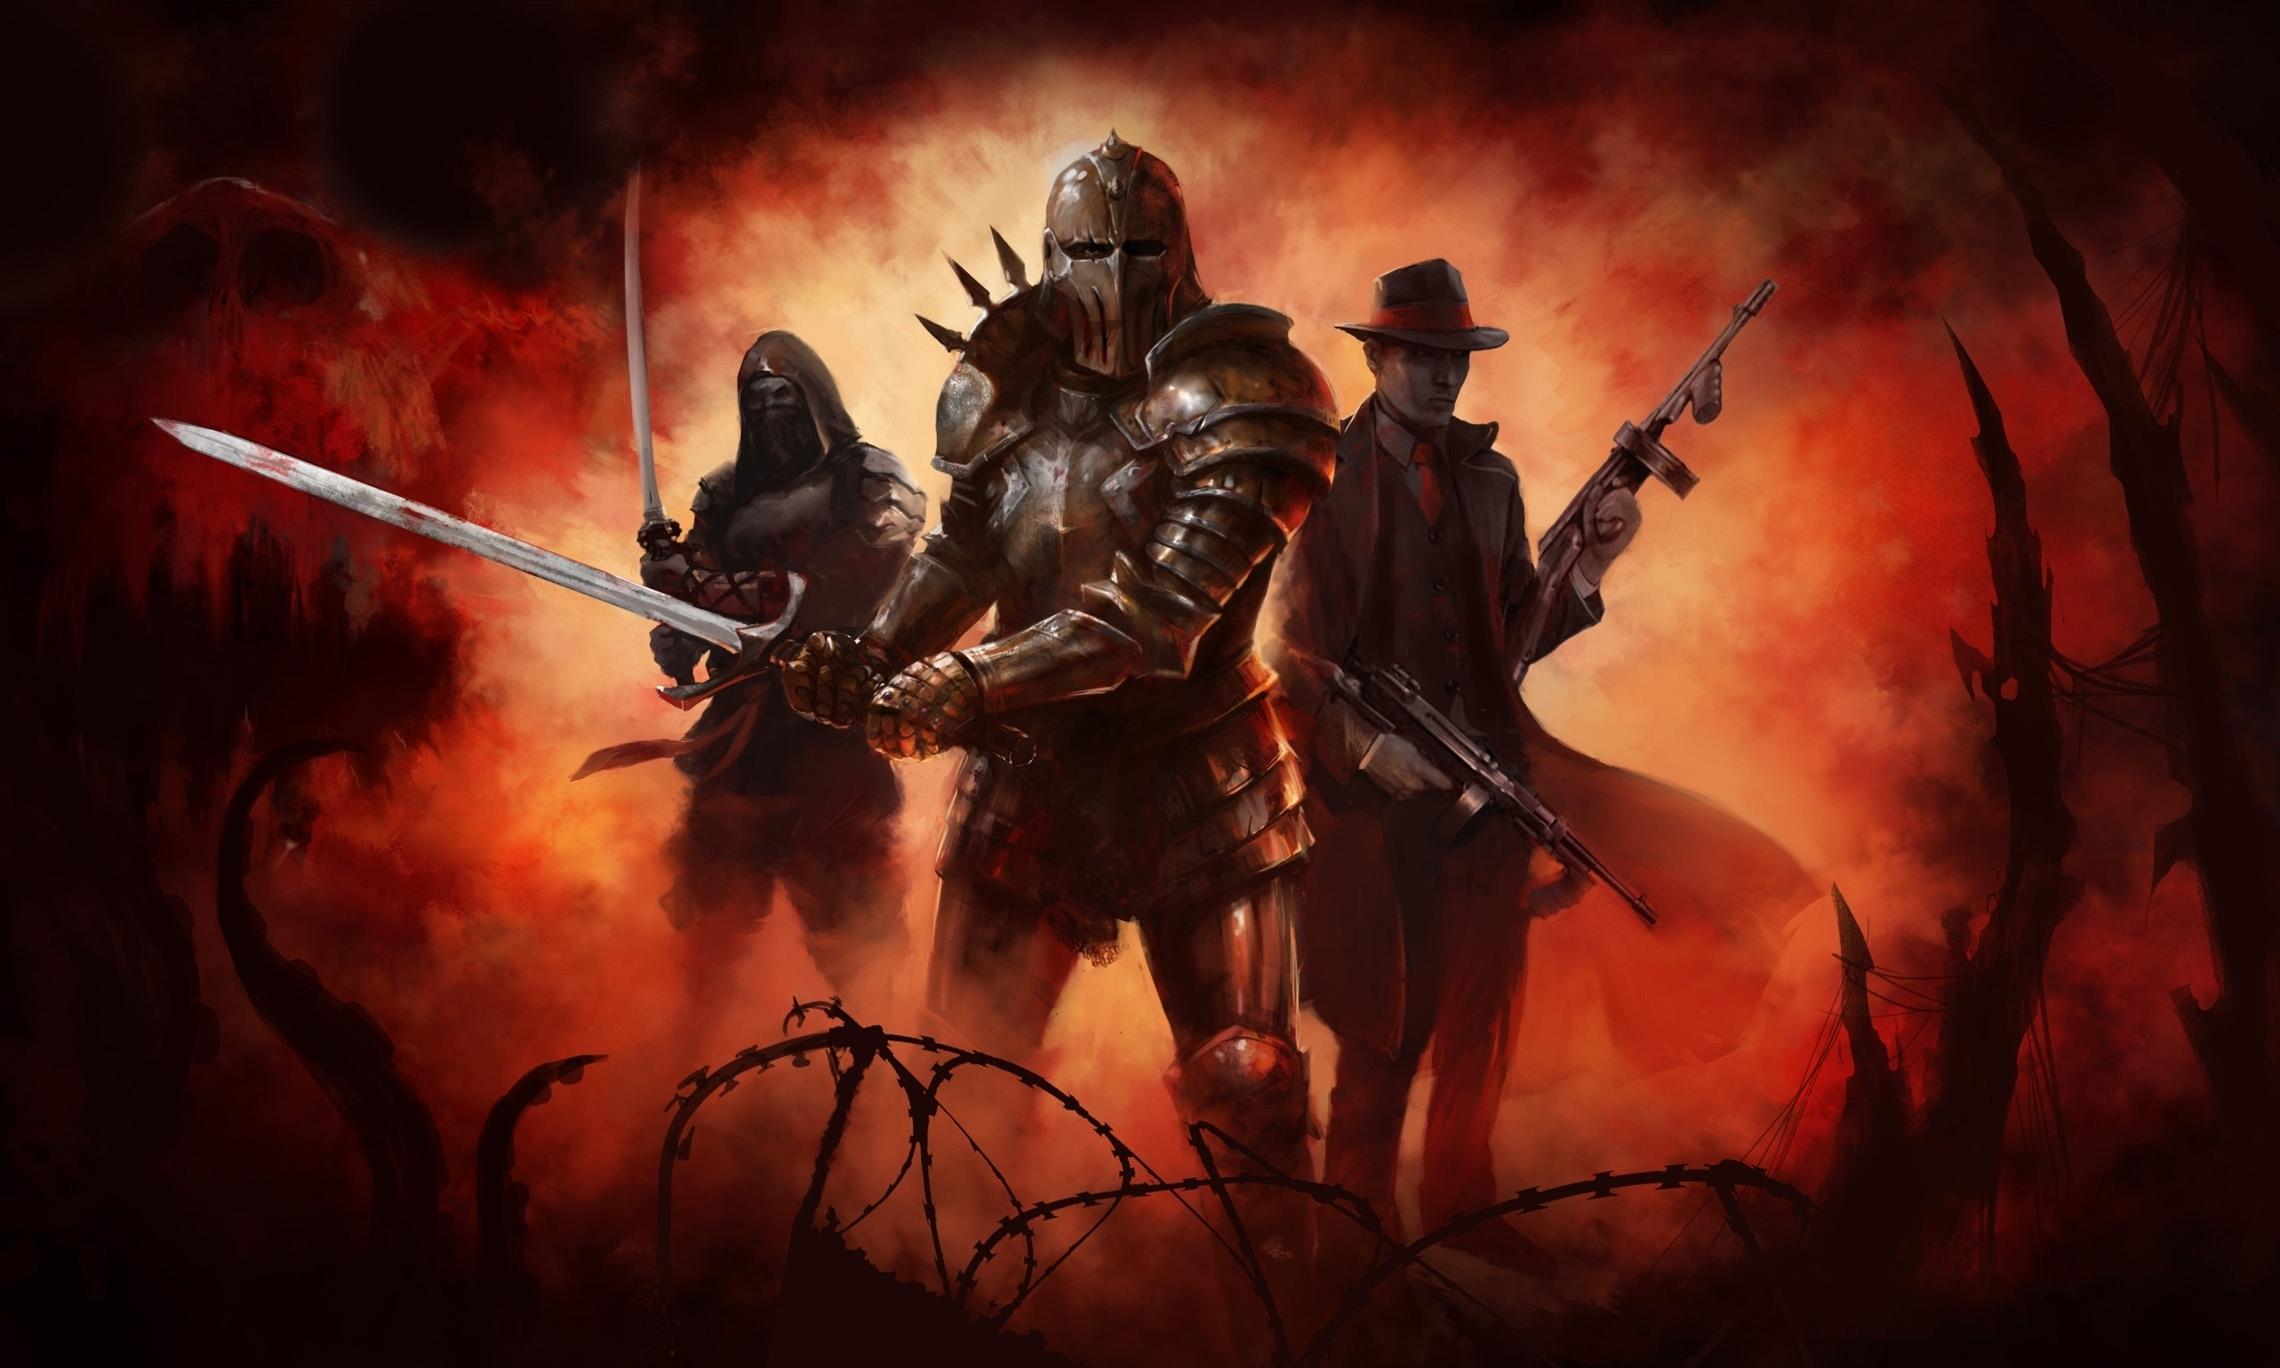 Armor Knight Wallpaper Warrior Knight Armor Weapon